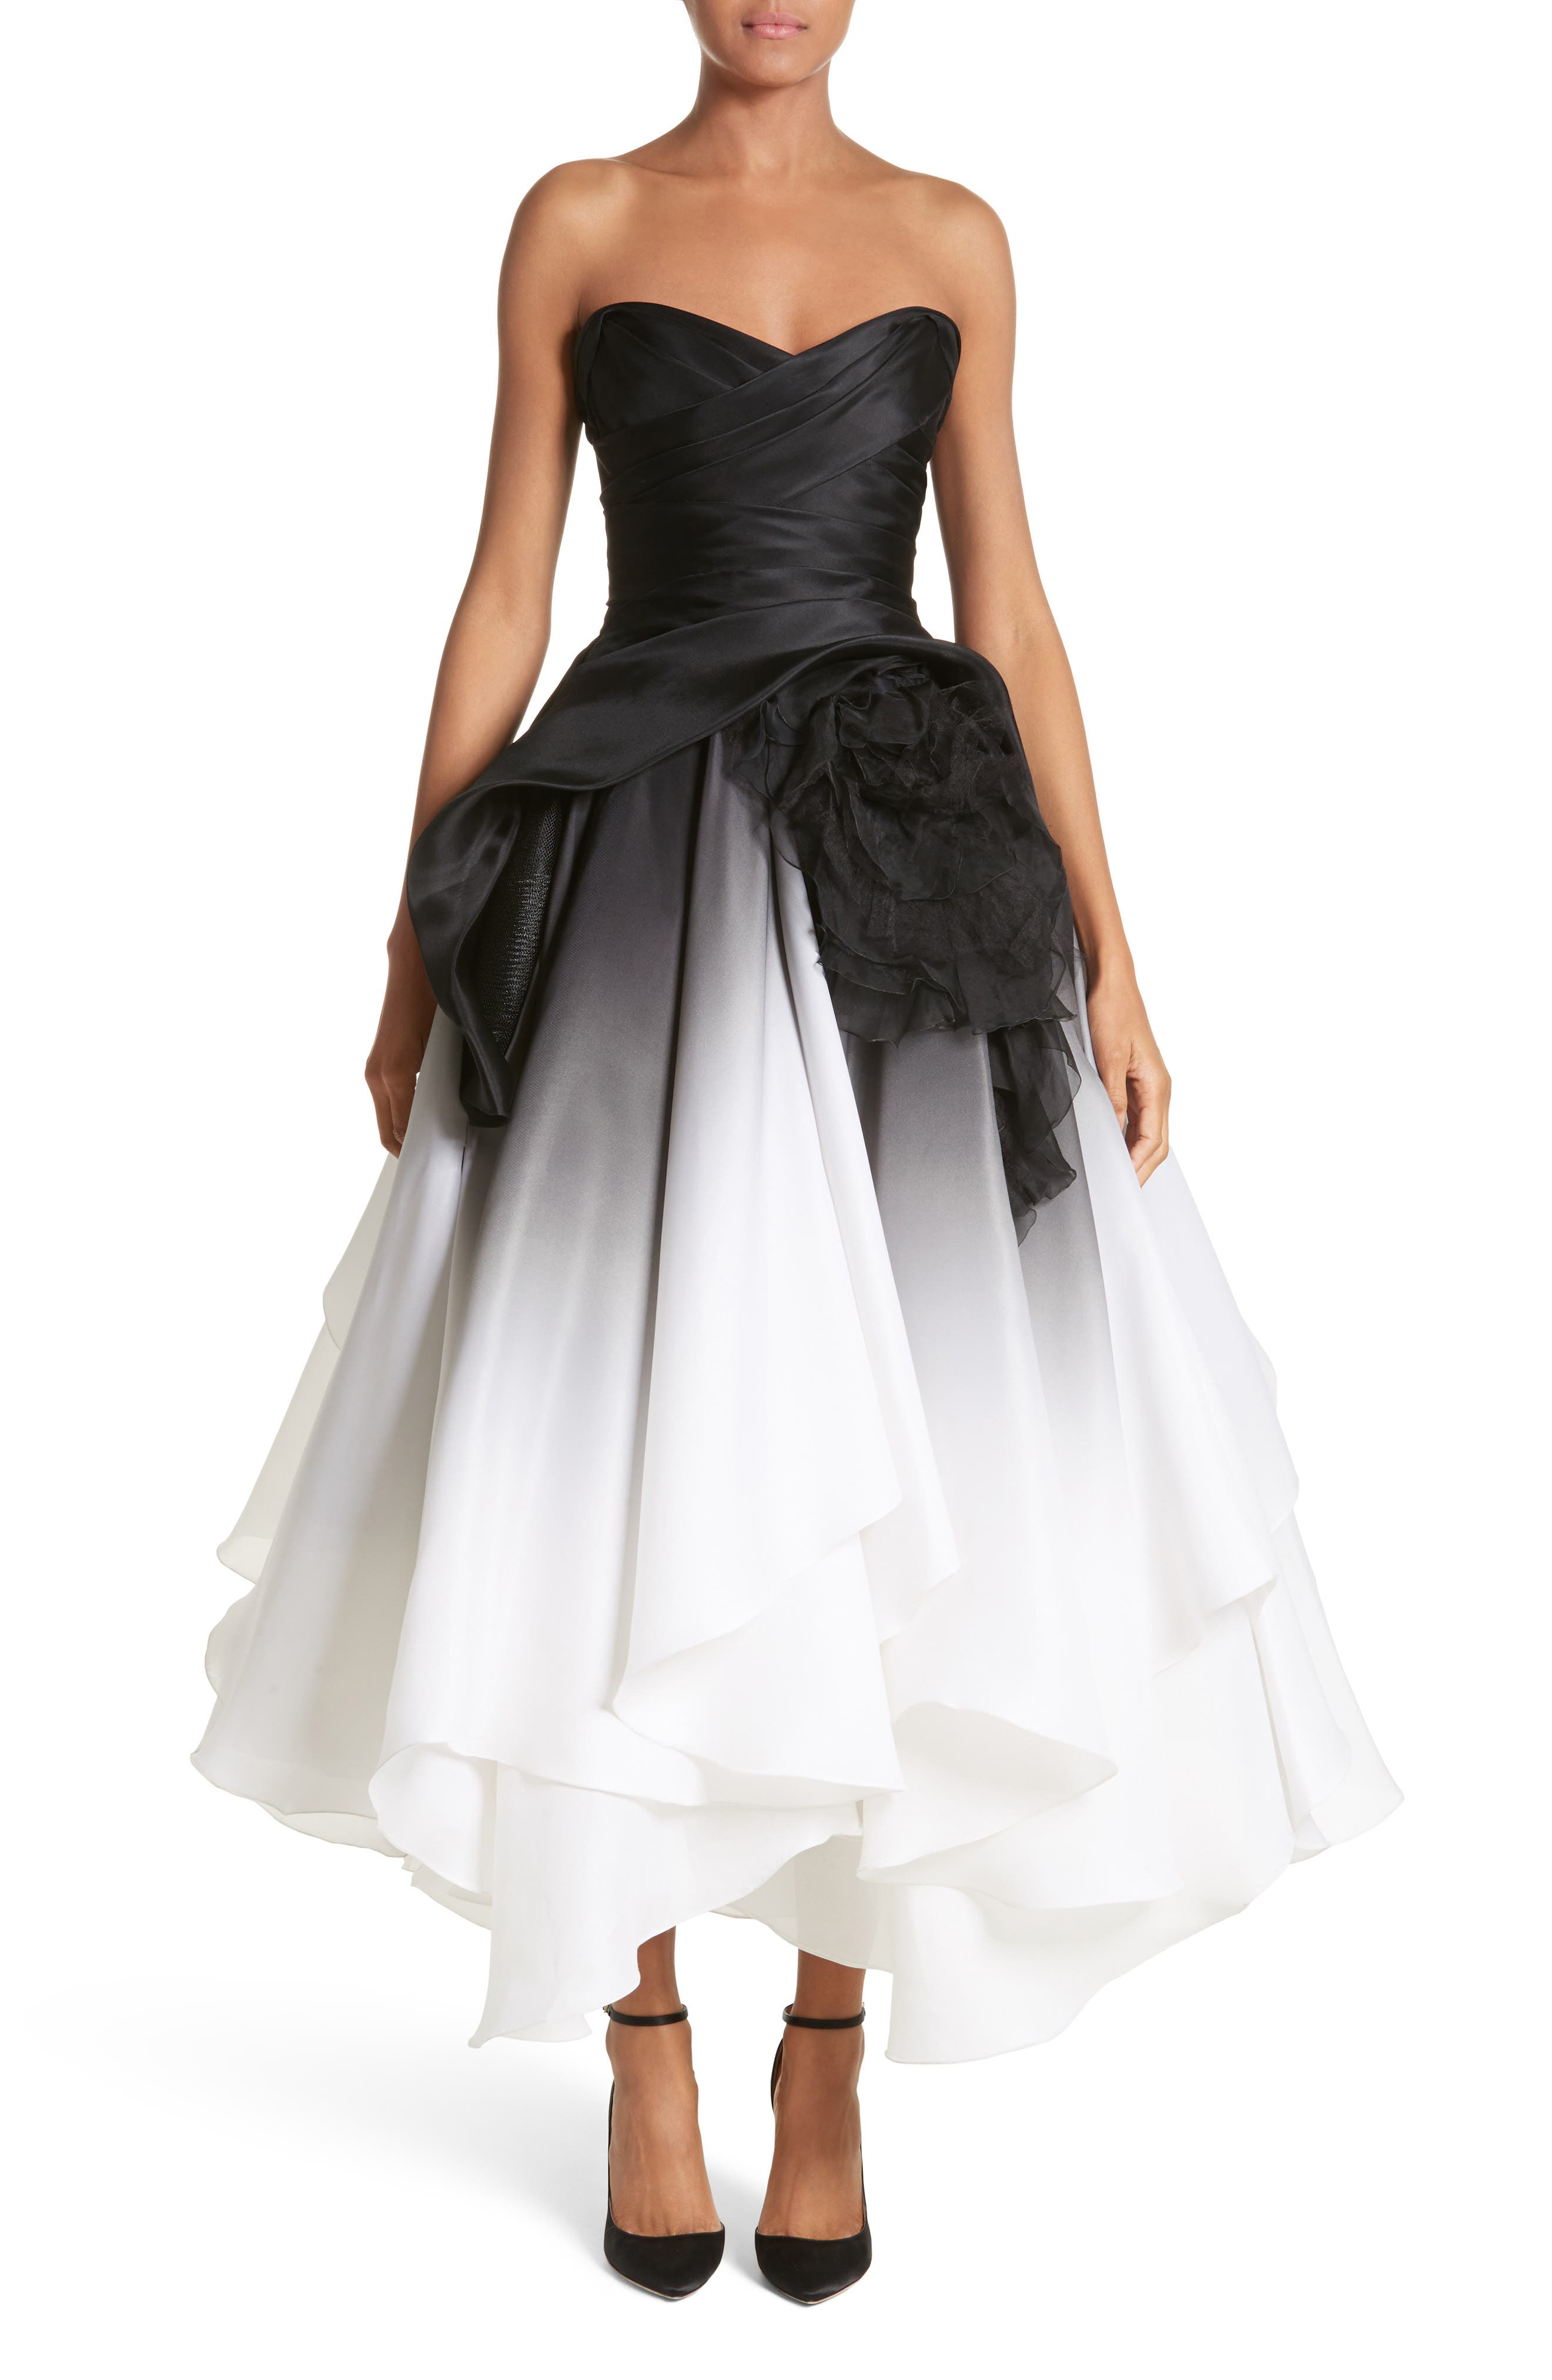 Ombré Strapless Tea Length Dress,                             Main thumbnail 1, color,                             Black/ White